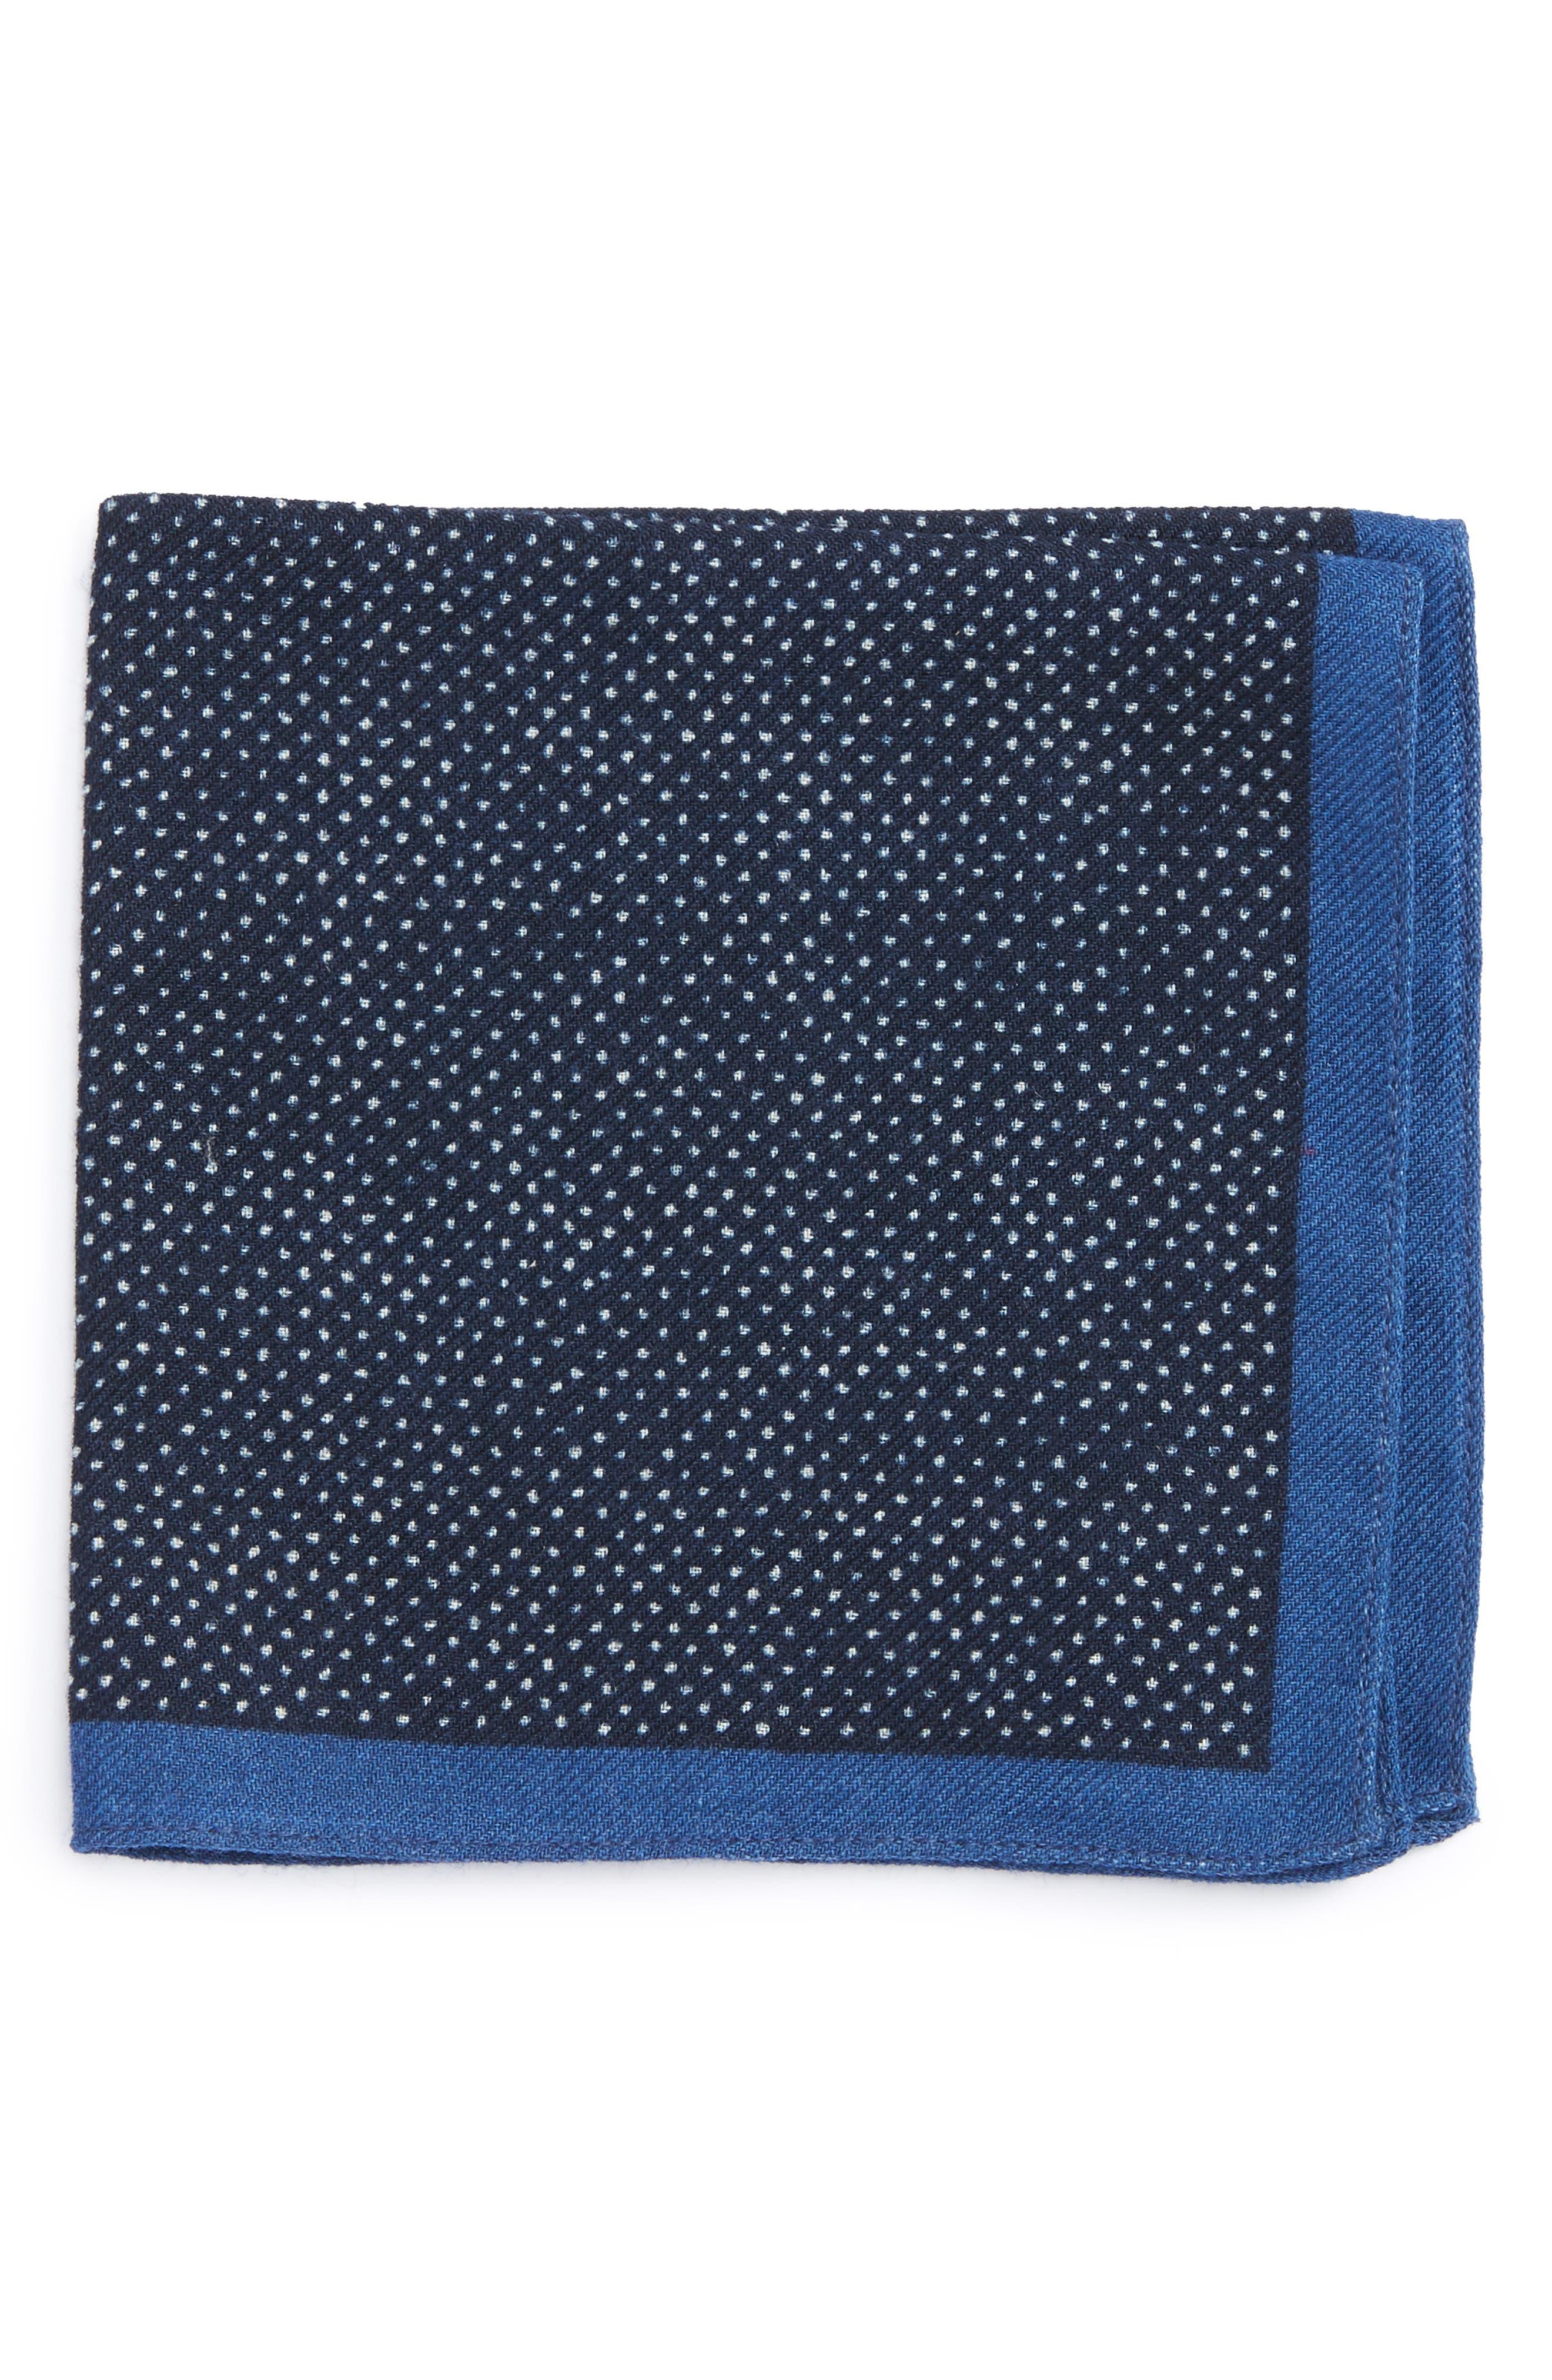 Main Image - BOSS Dot Wool Pocket Square